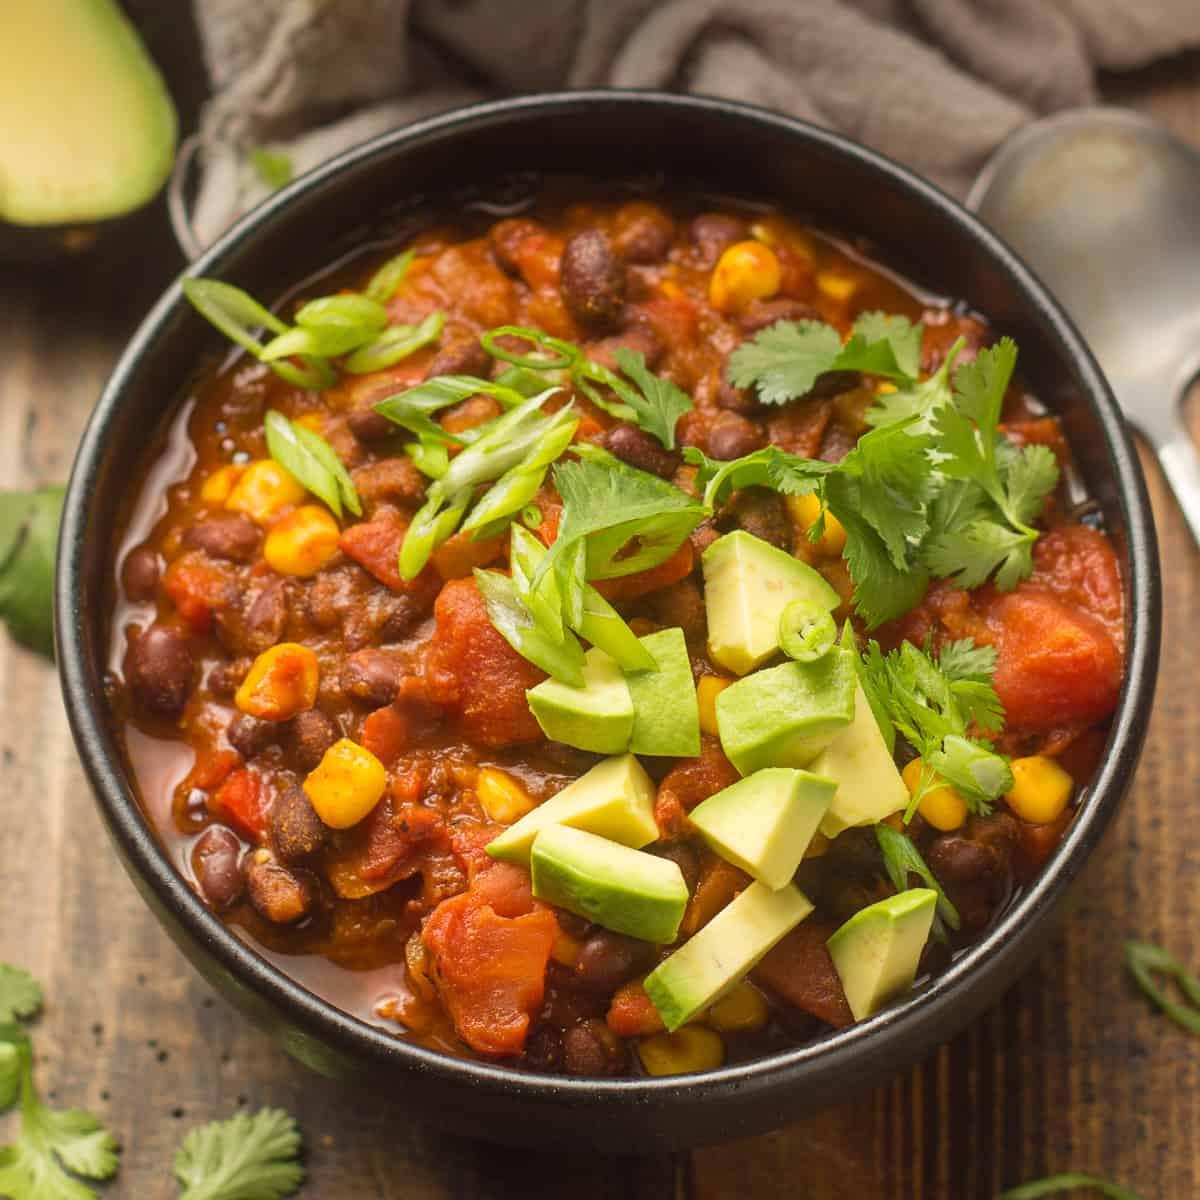 Bowl of Black Bean Chili Topped with Avocado, Scallions and Cilantro